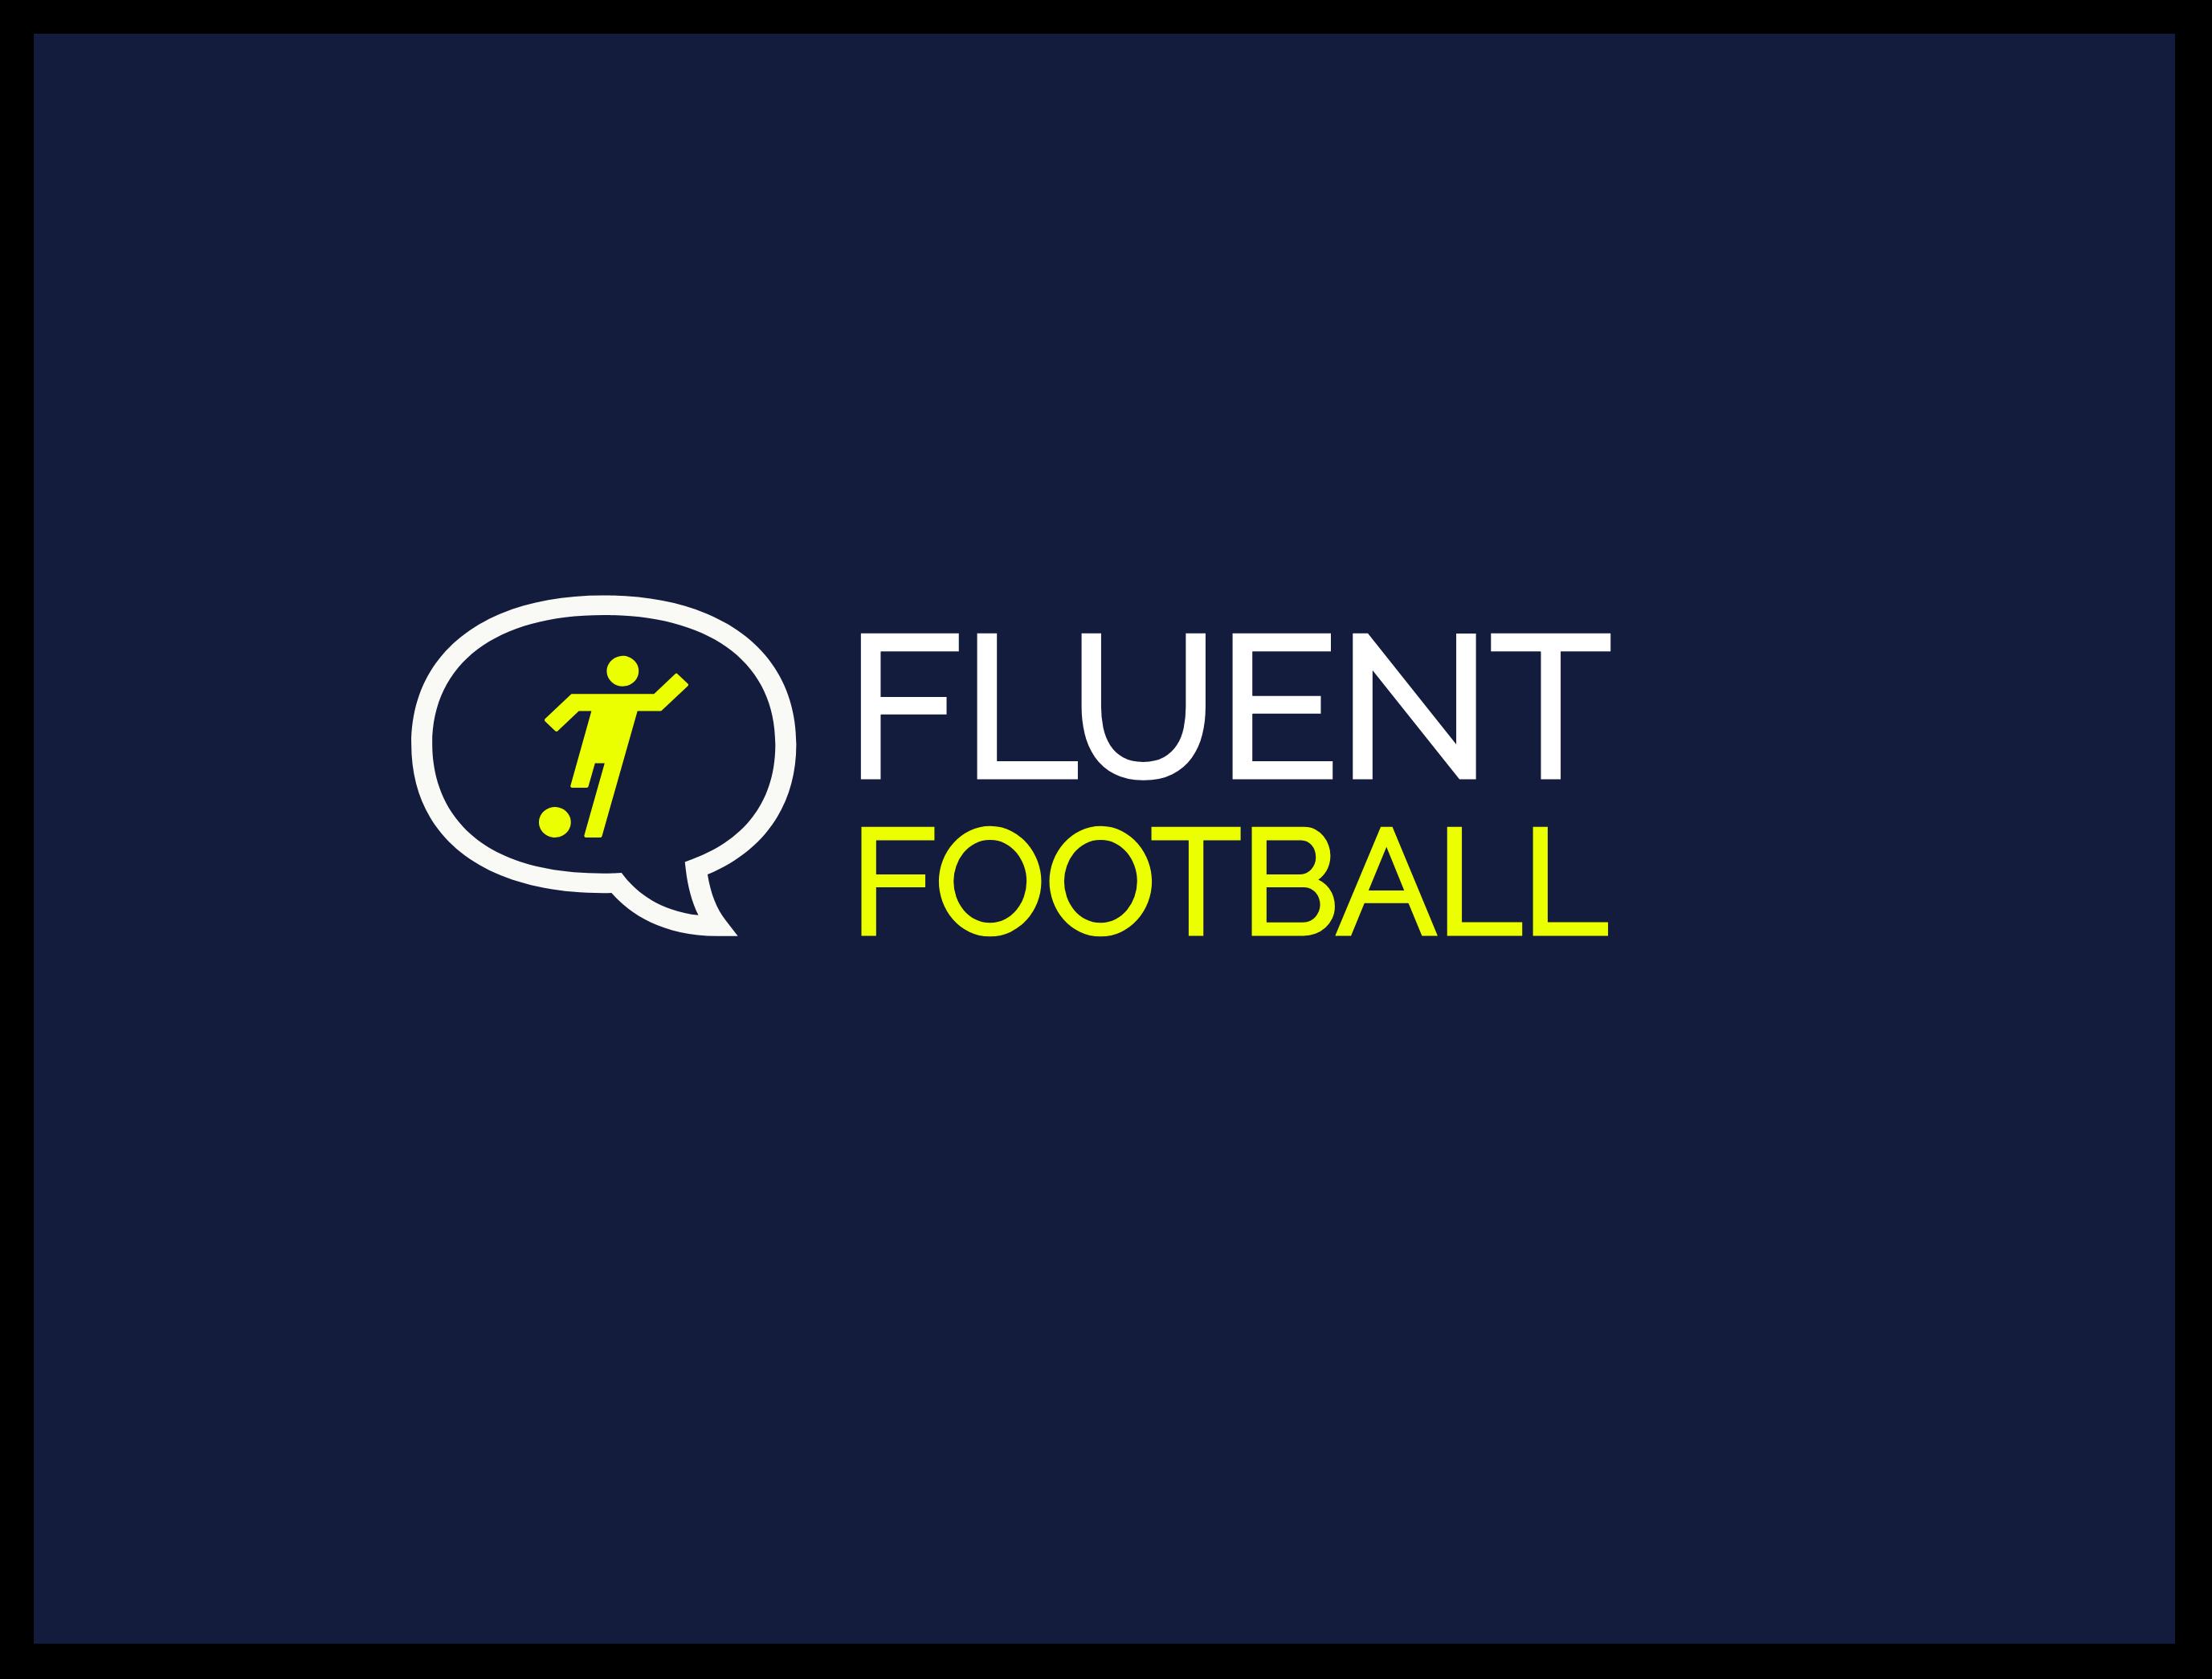 Fluent Football